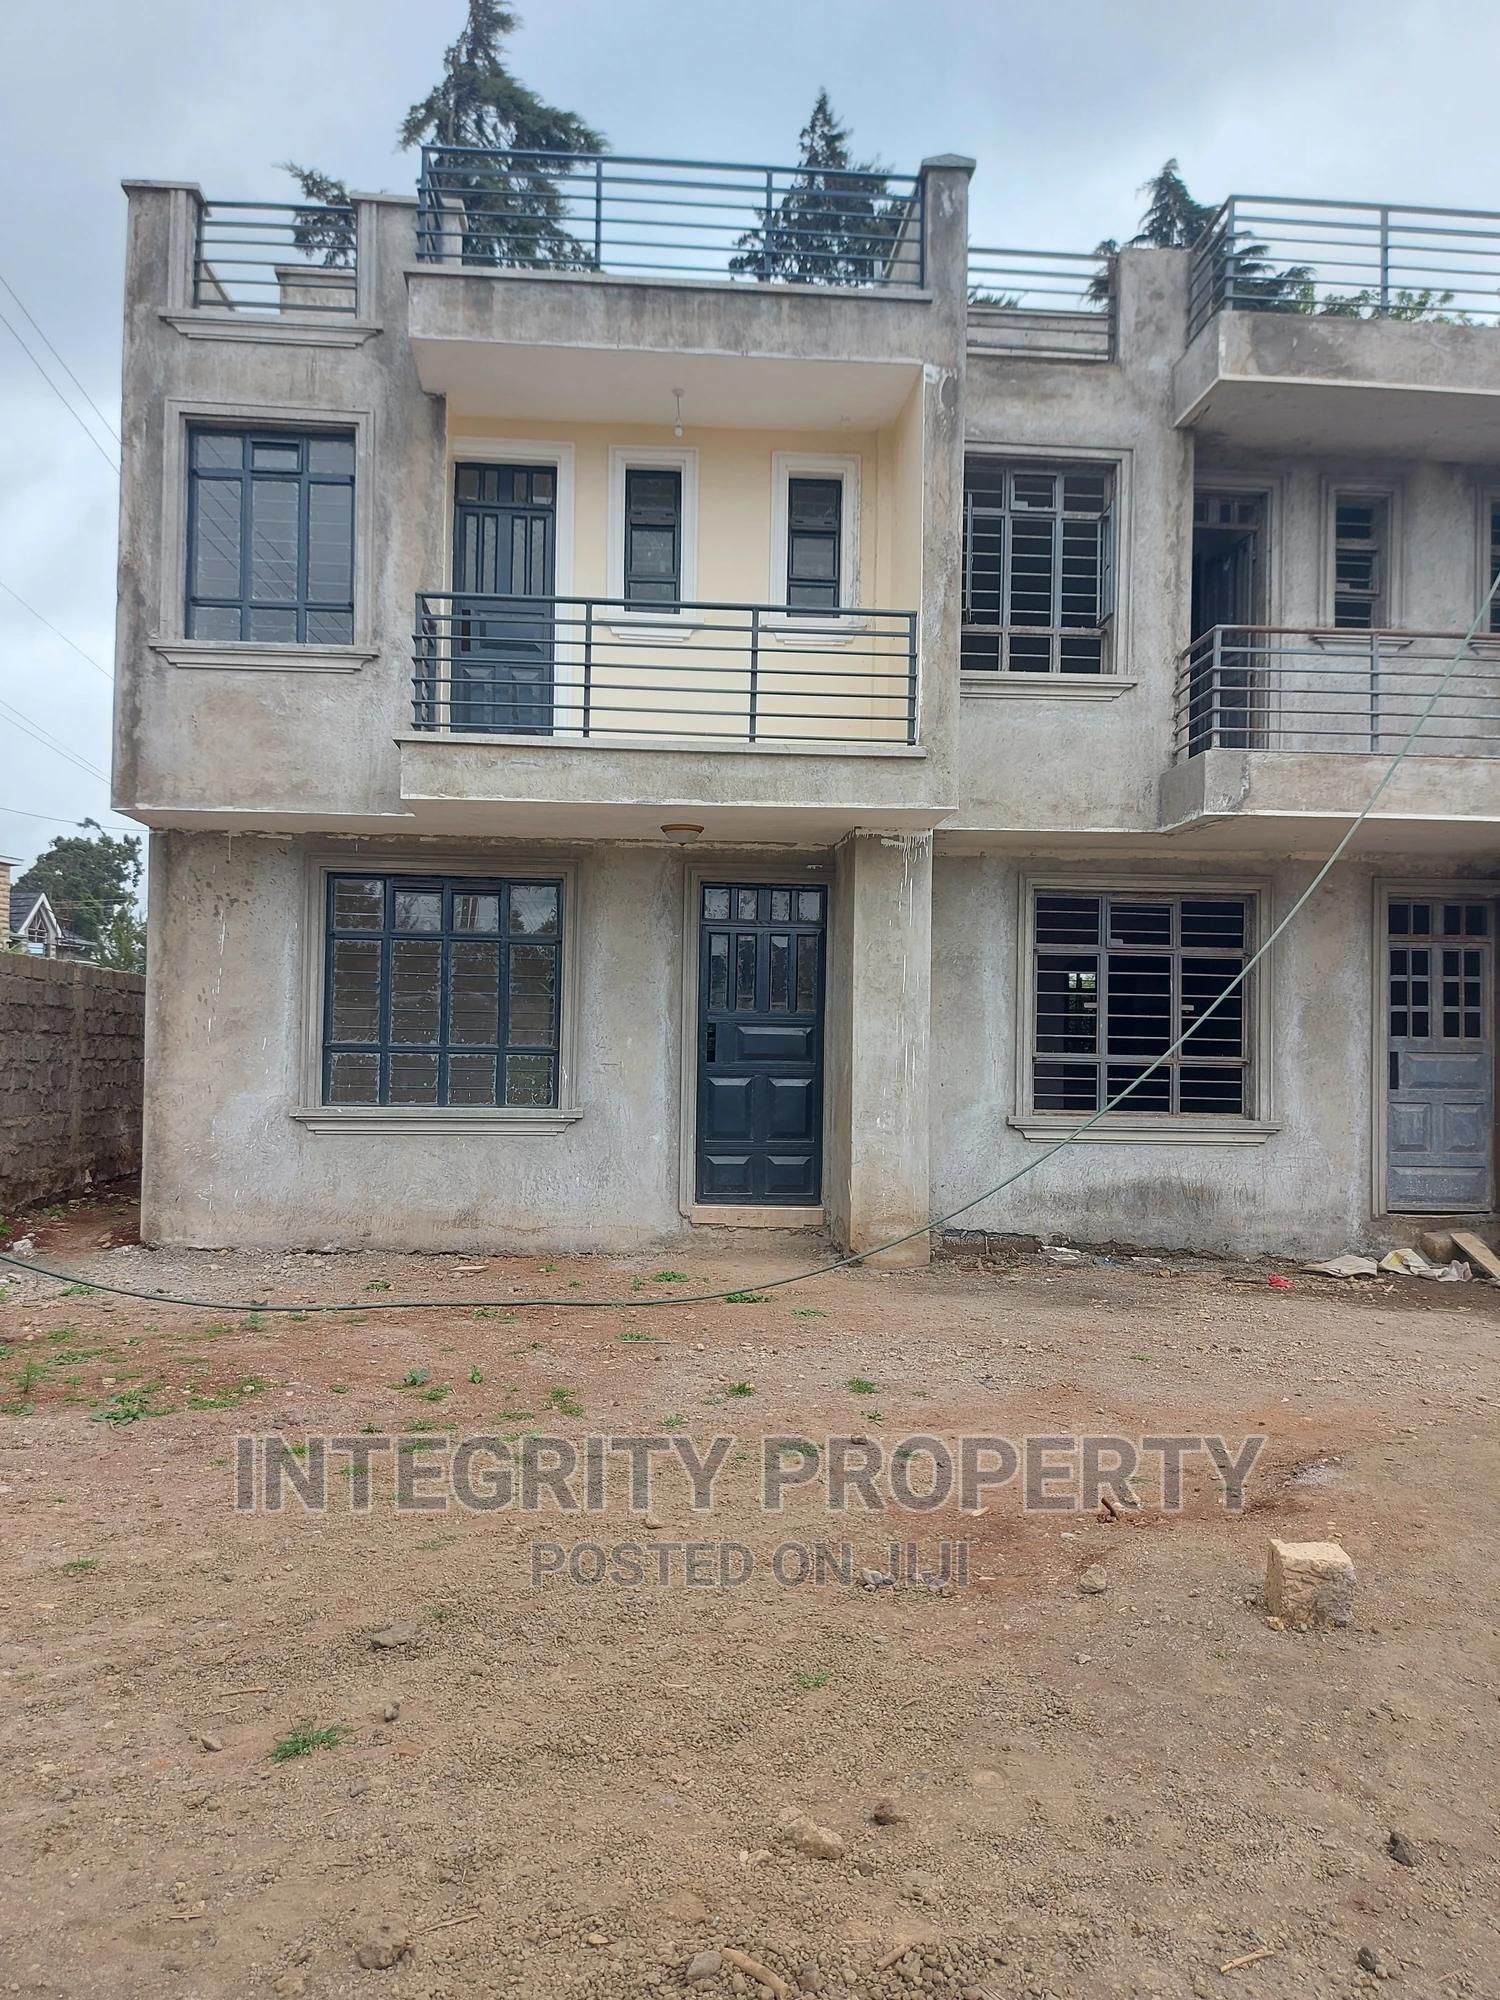 3bdrm Townhouse in Ngong Kibiku for Sale